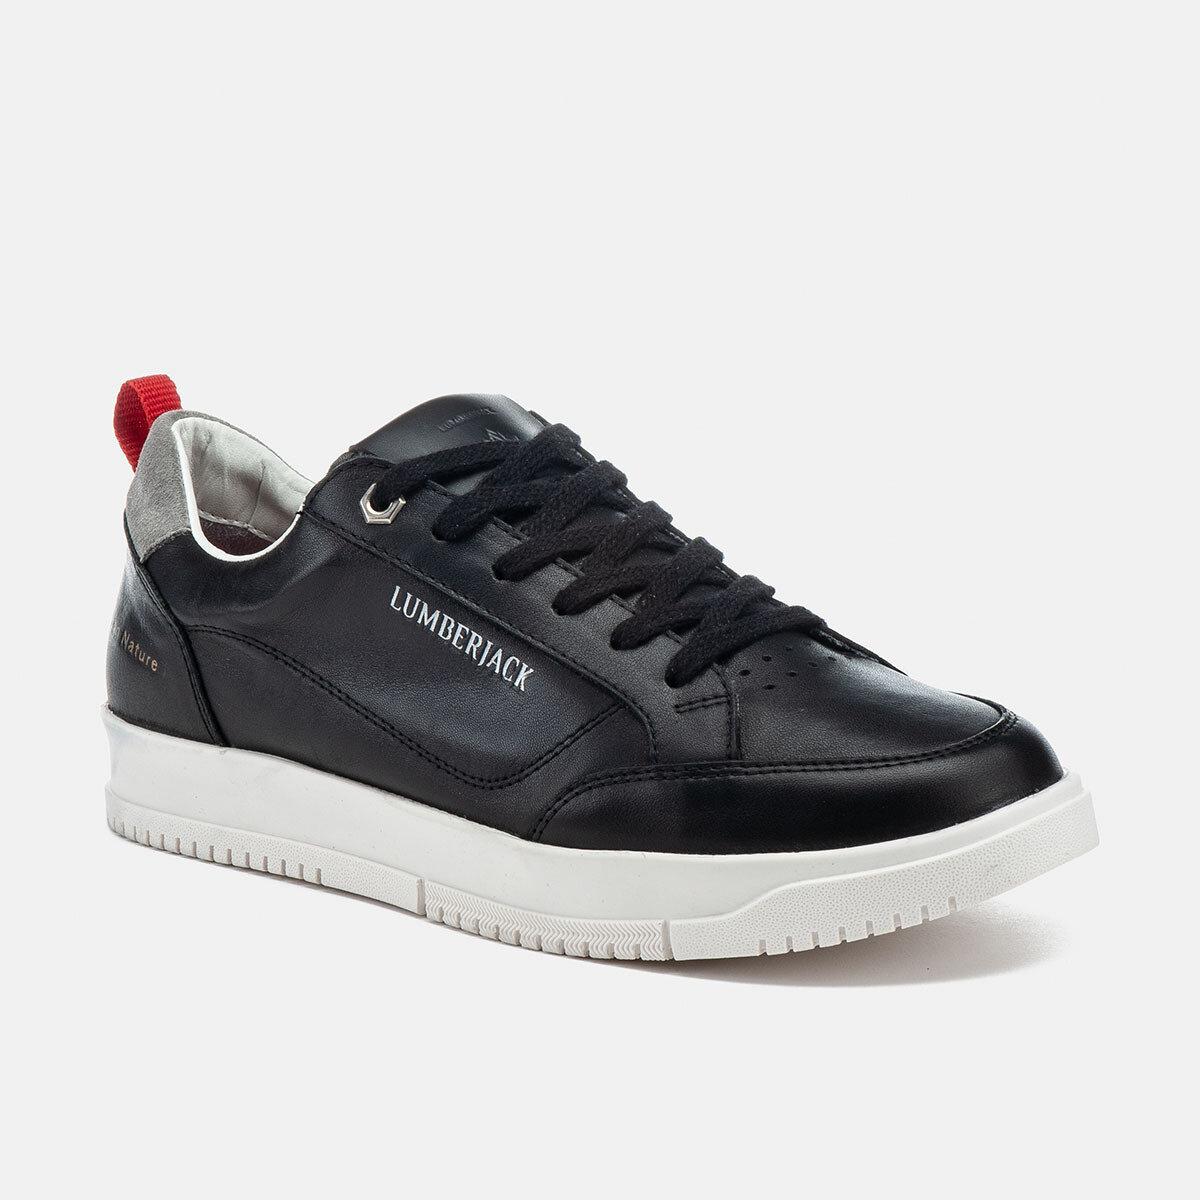 RAMBLA BLACK/CIMENT GREY Man Sneakers